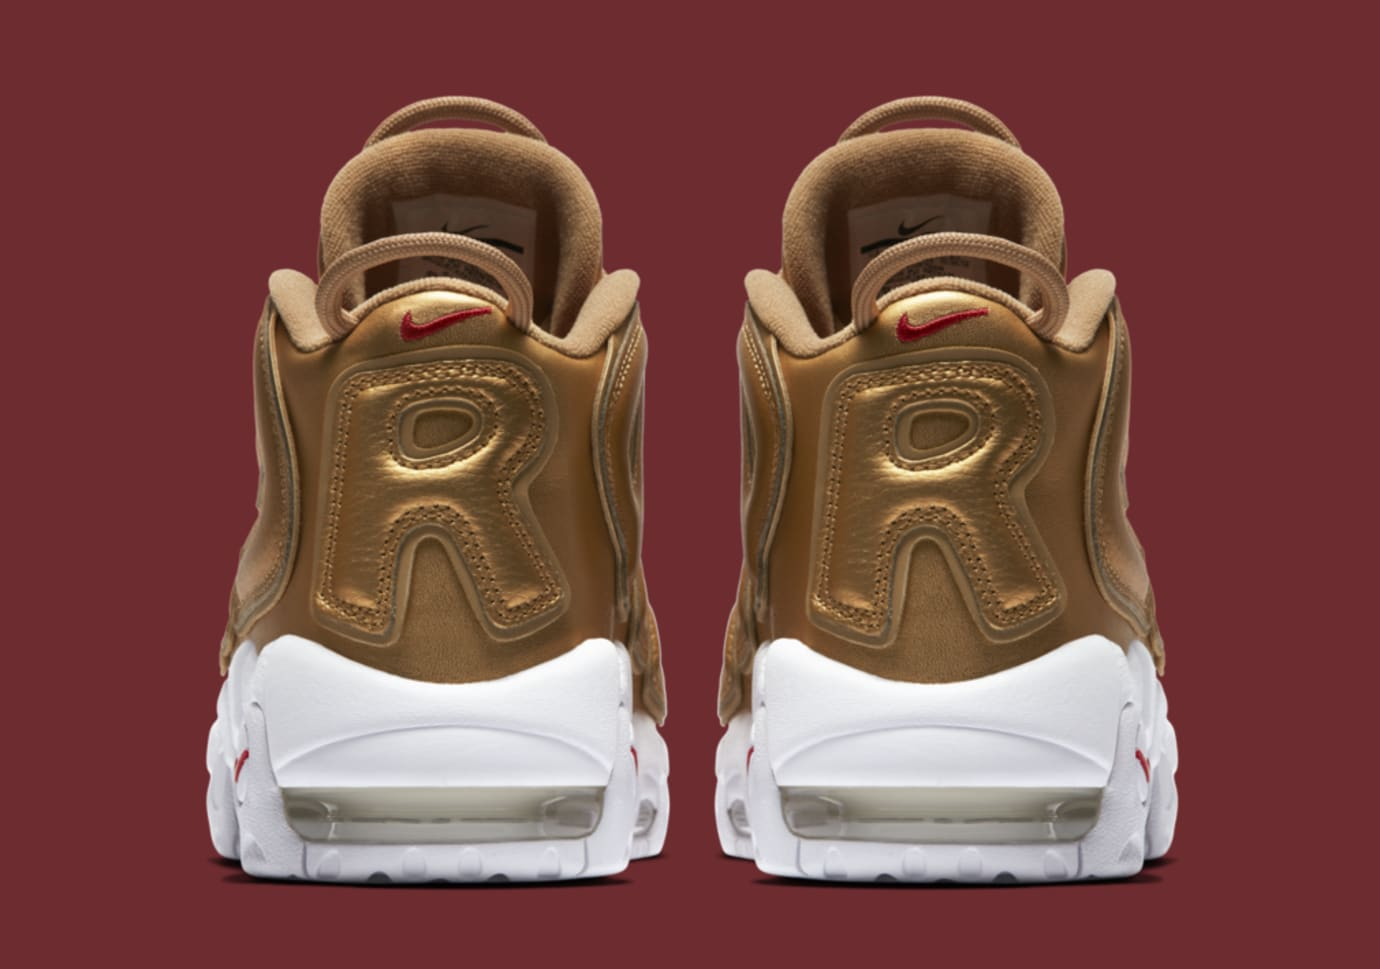 Gold Supreme Nike Air More Uptempo 902290-700 Heel